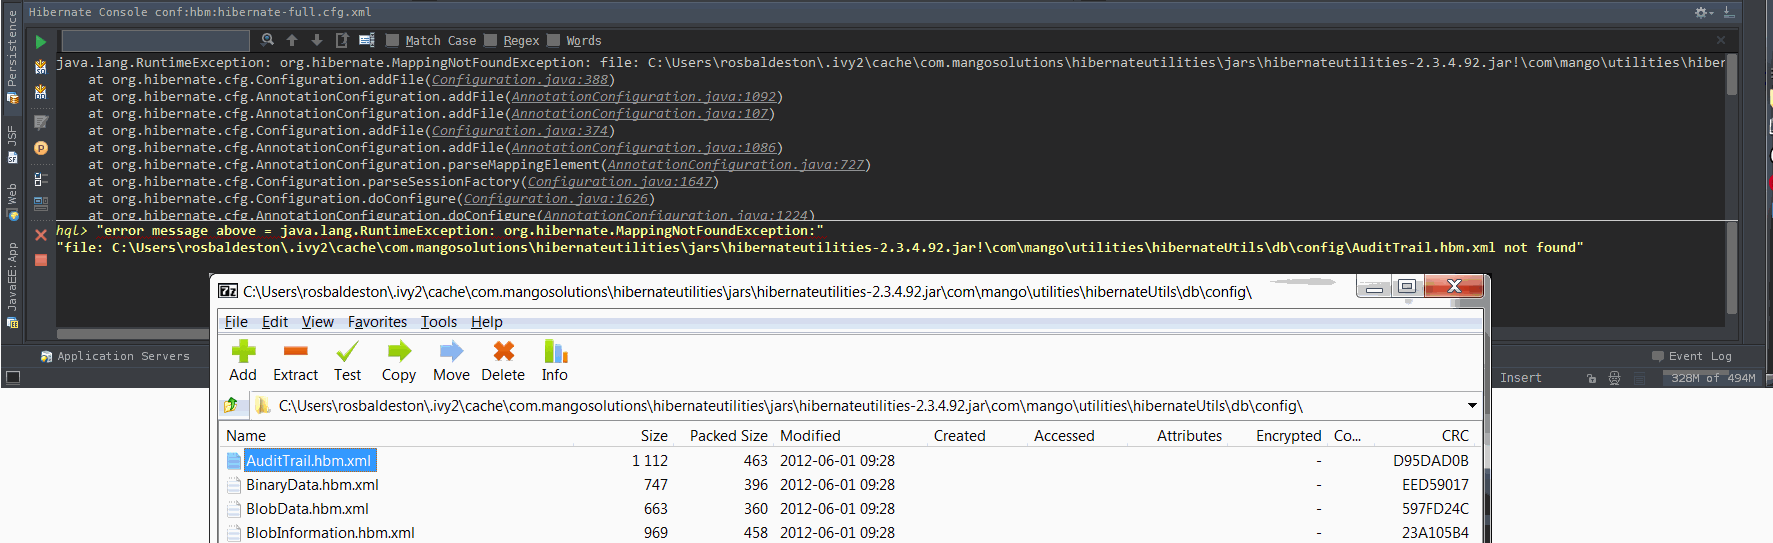 generateDDL_error.png